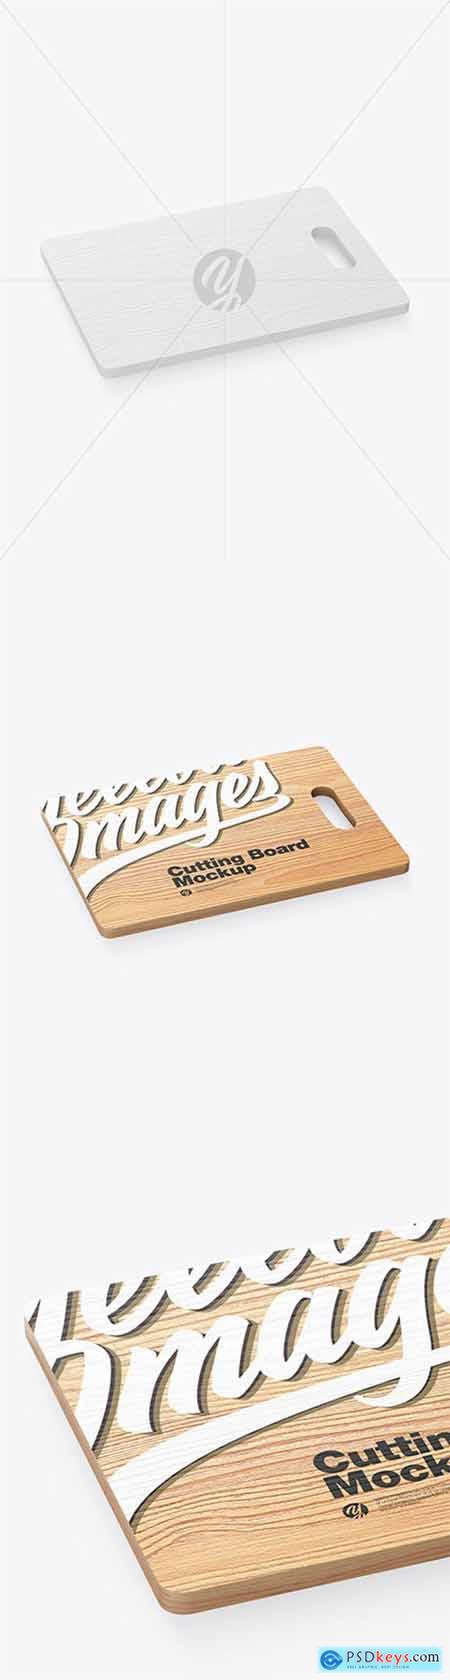 Wooden Cutting Board Mockup 60840